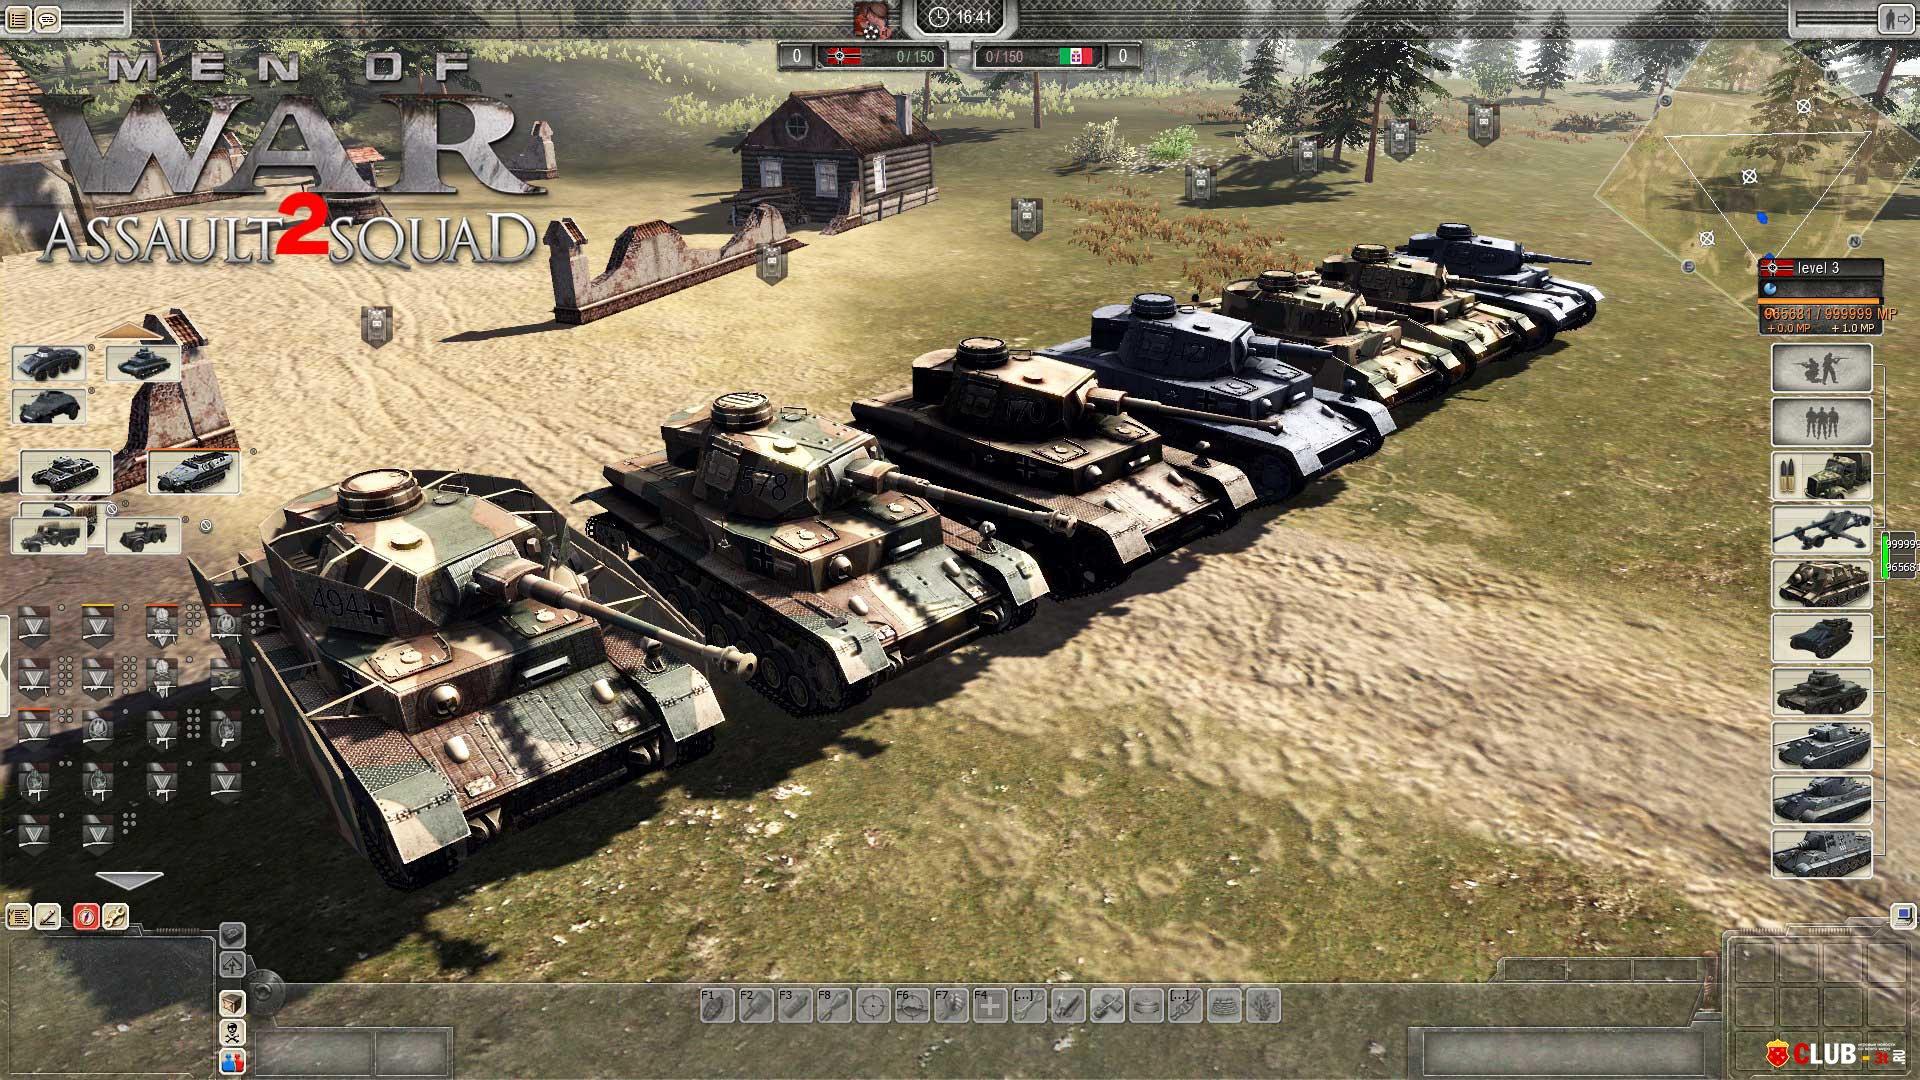 Men of war assault squad 2 cold war mod - 26164